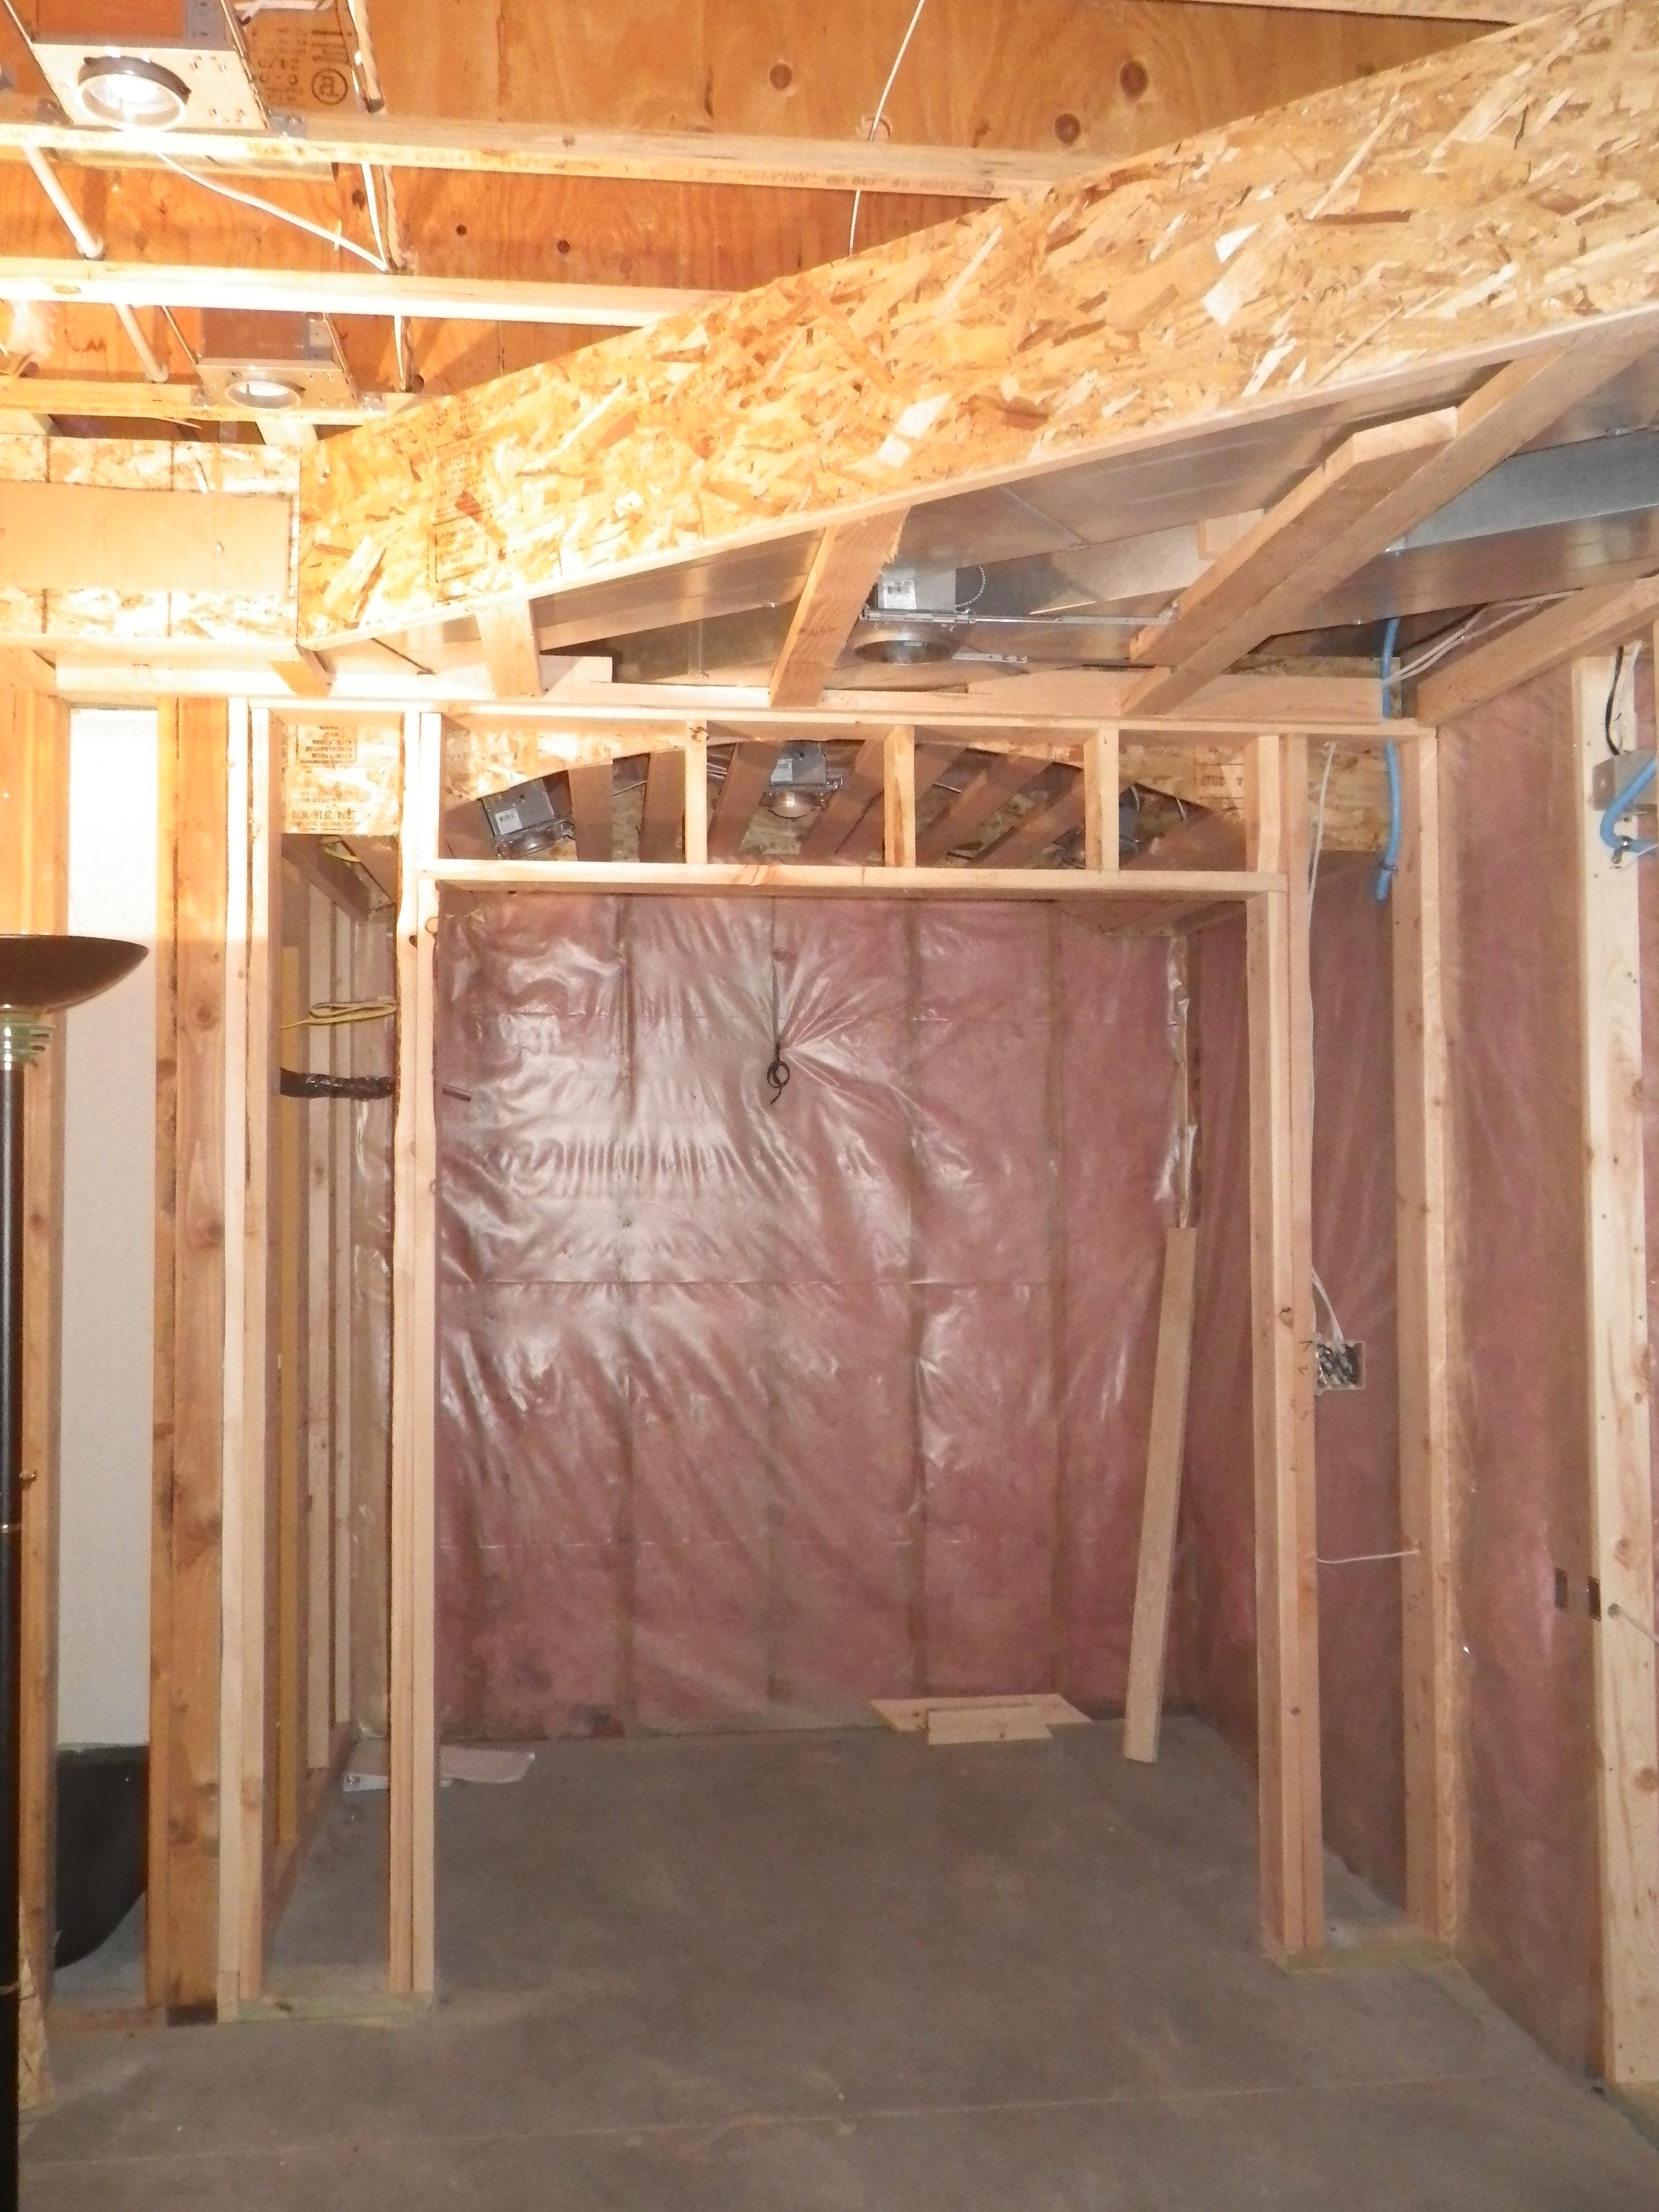 Diy plans wine rack cellar download build small wood for Building wine racks for cellar